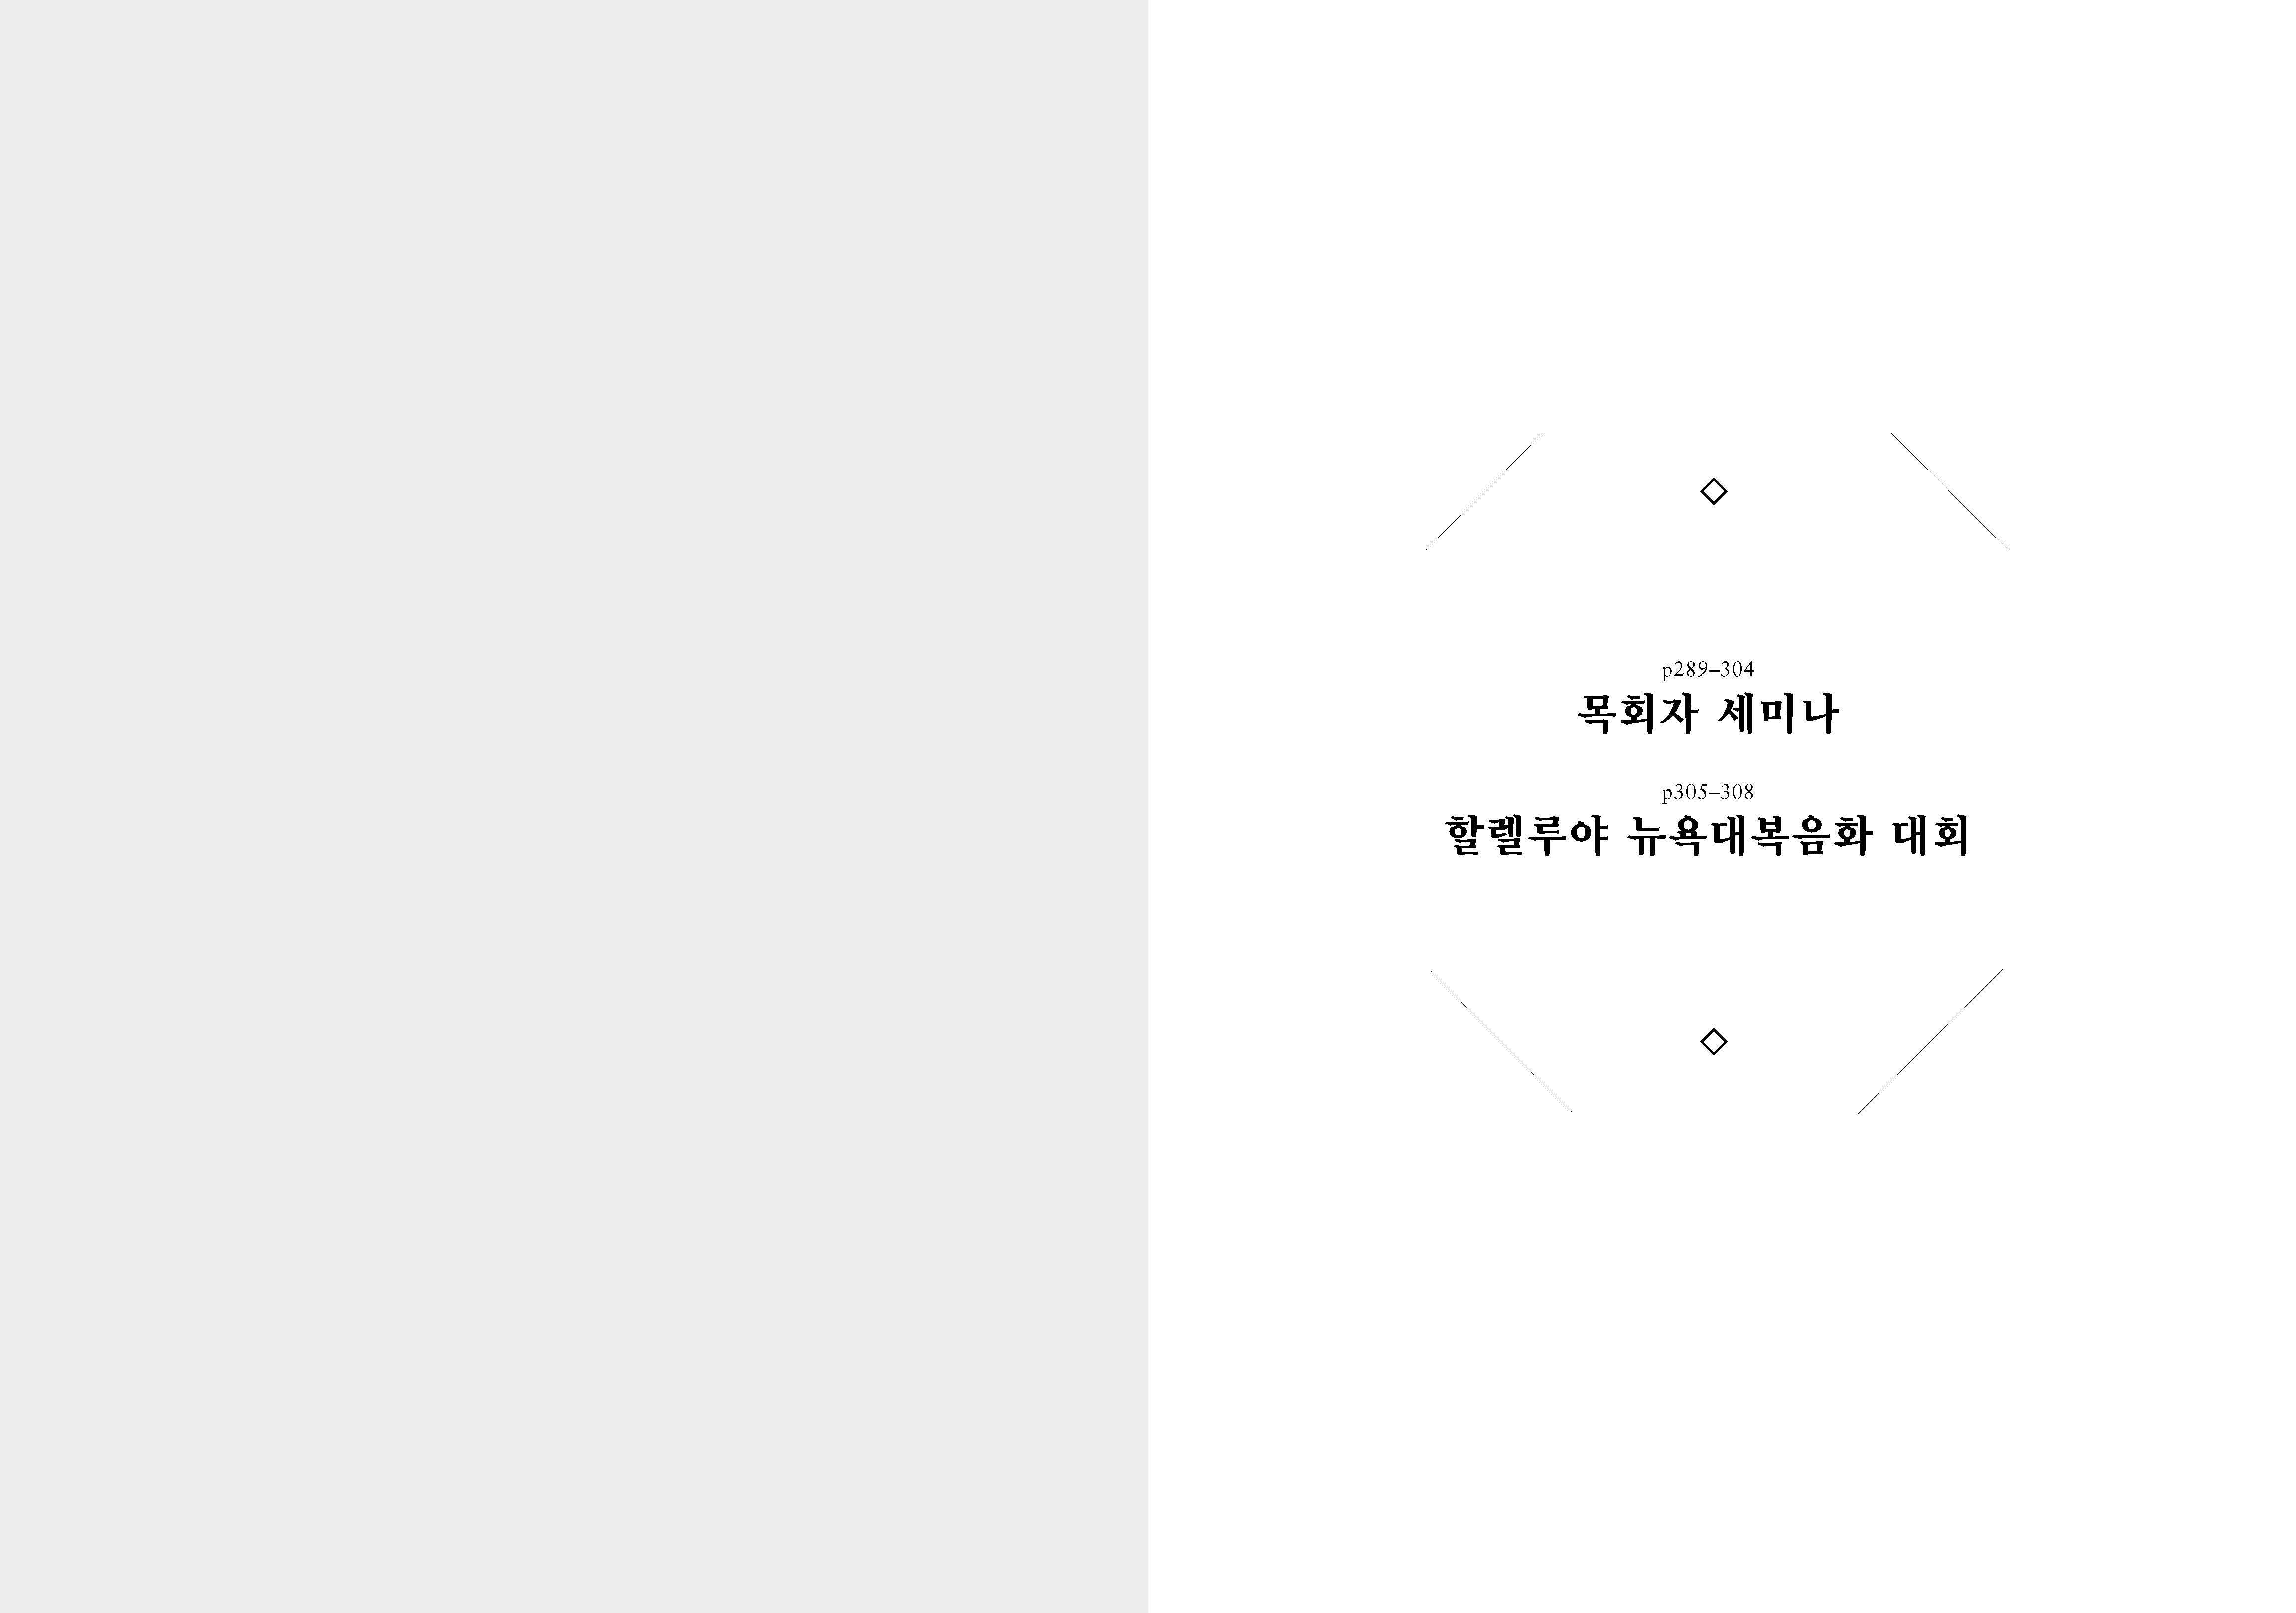 40th_Page_151.jpg